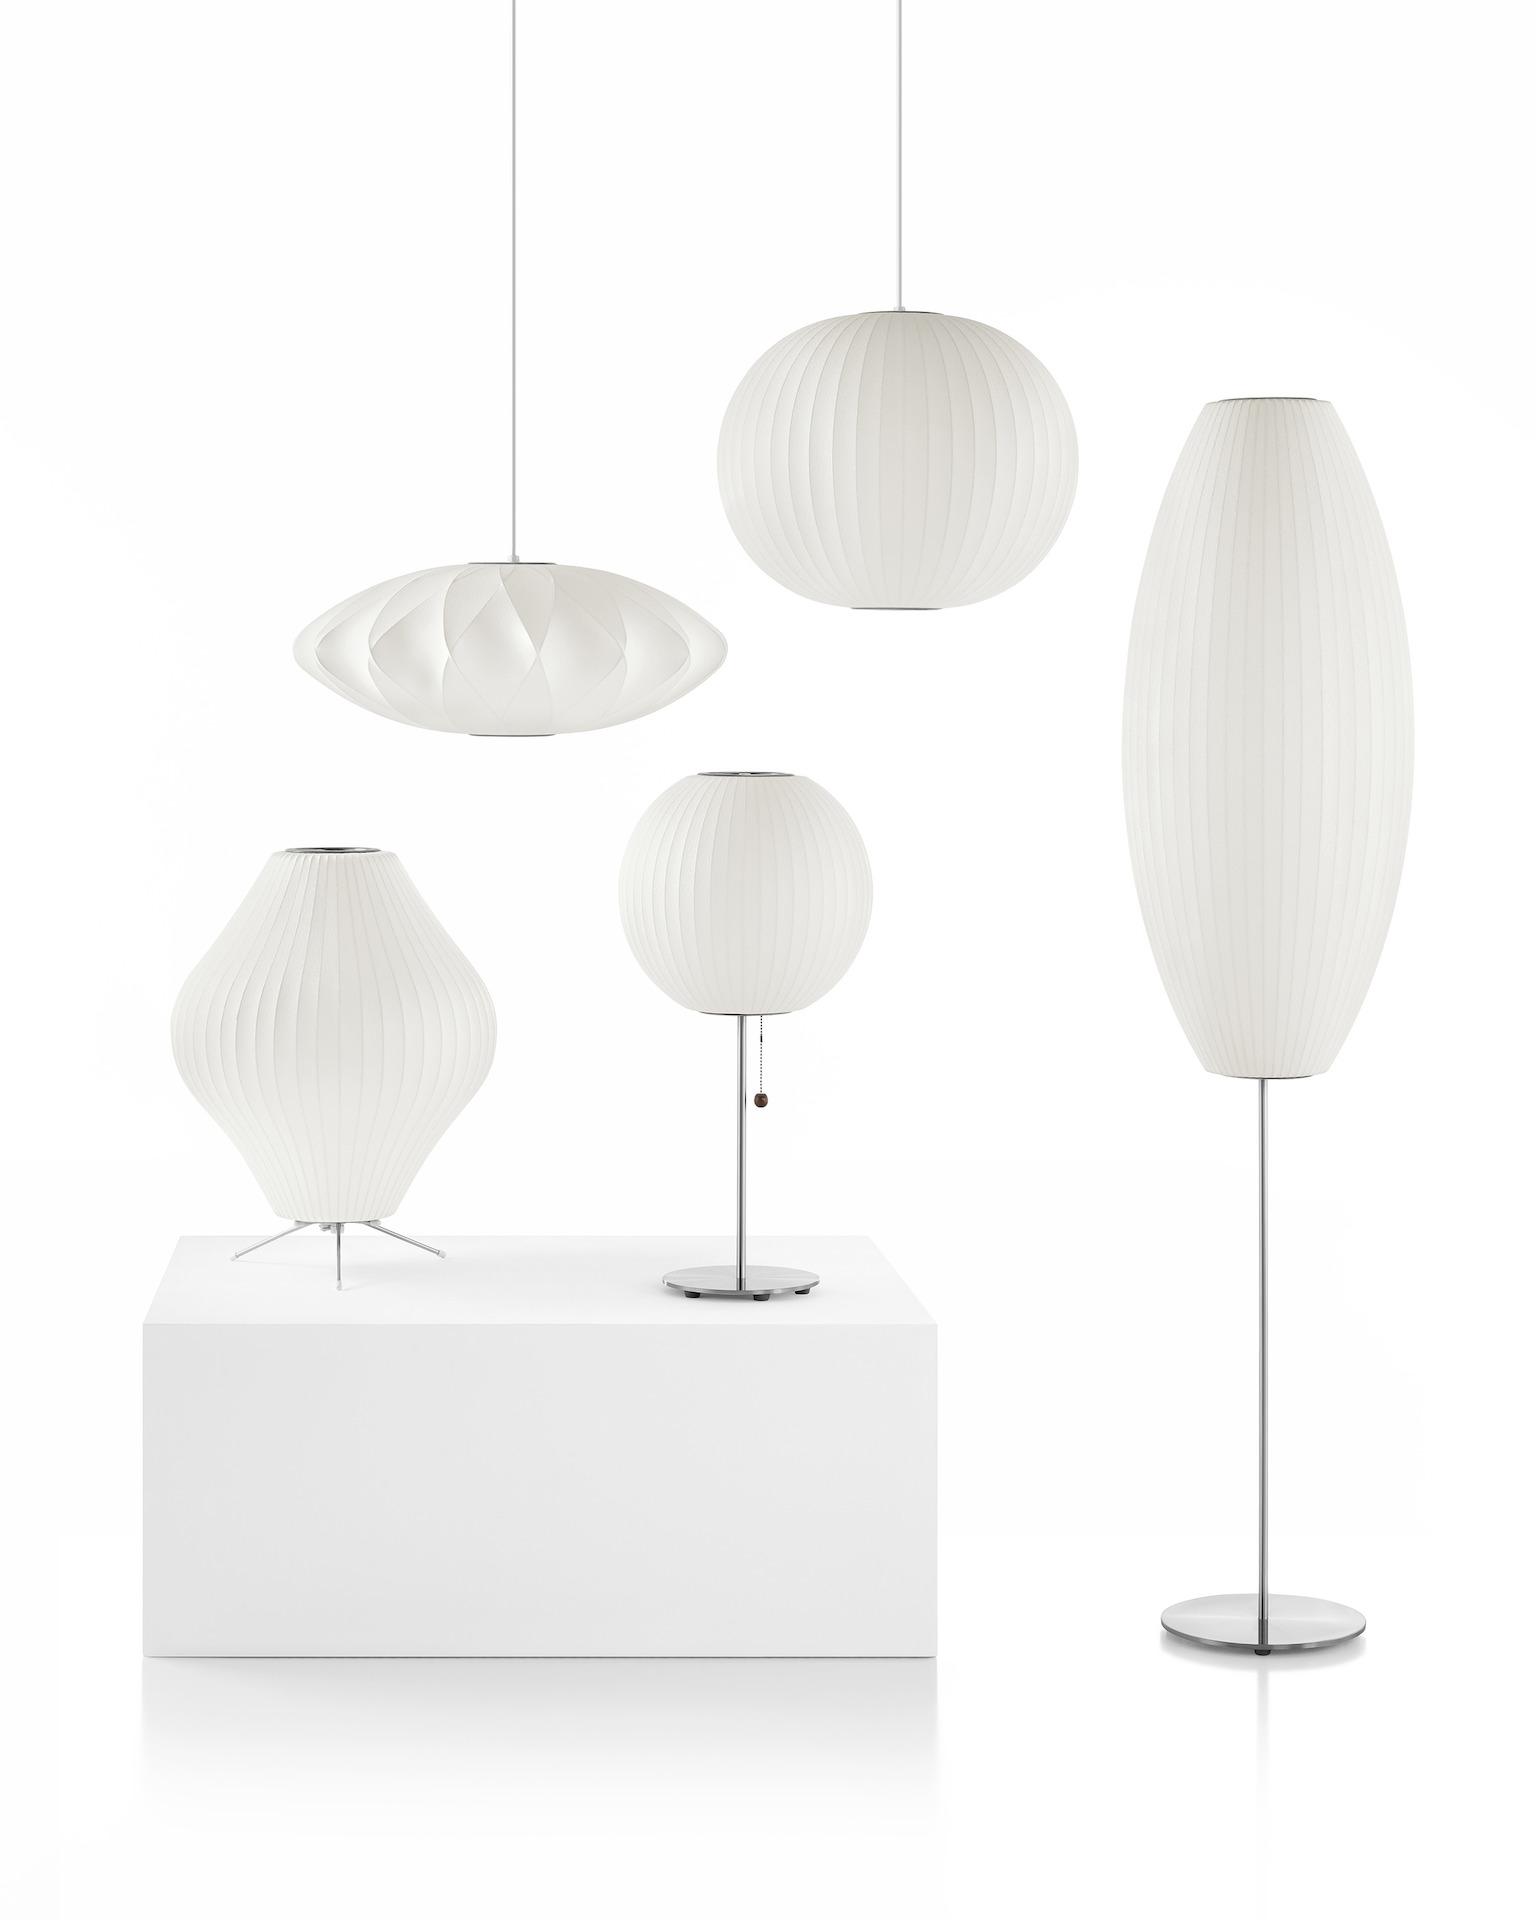 Nelson Pear Floor Lamp